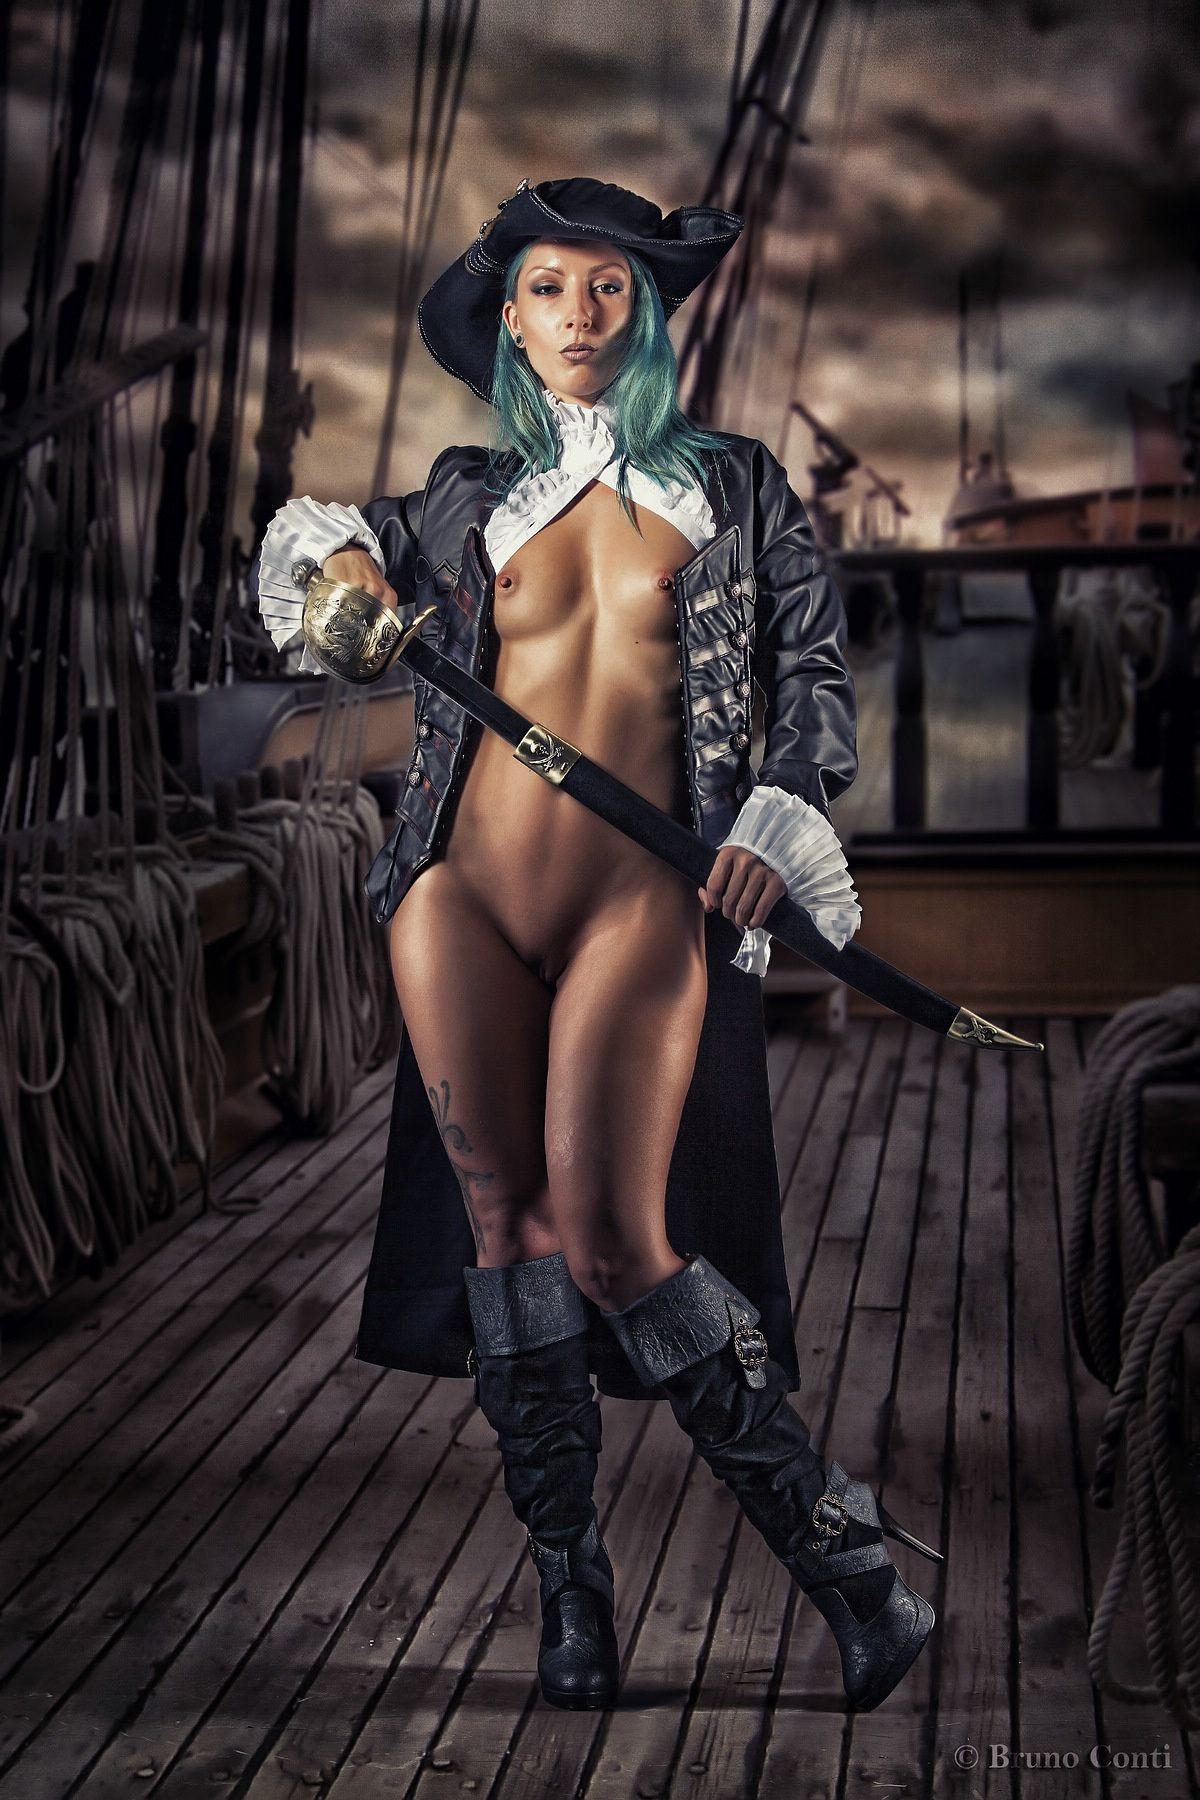 Seductive hollow out bra set high fantasy sexy school girl student uniform costume